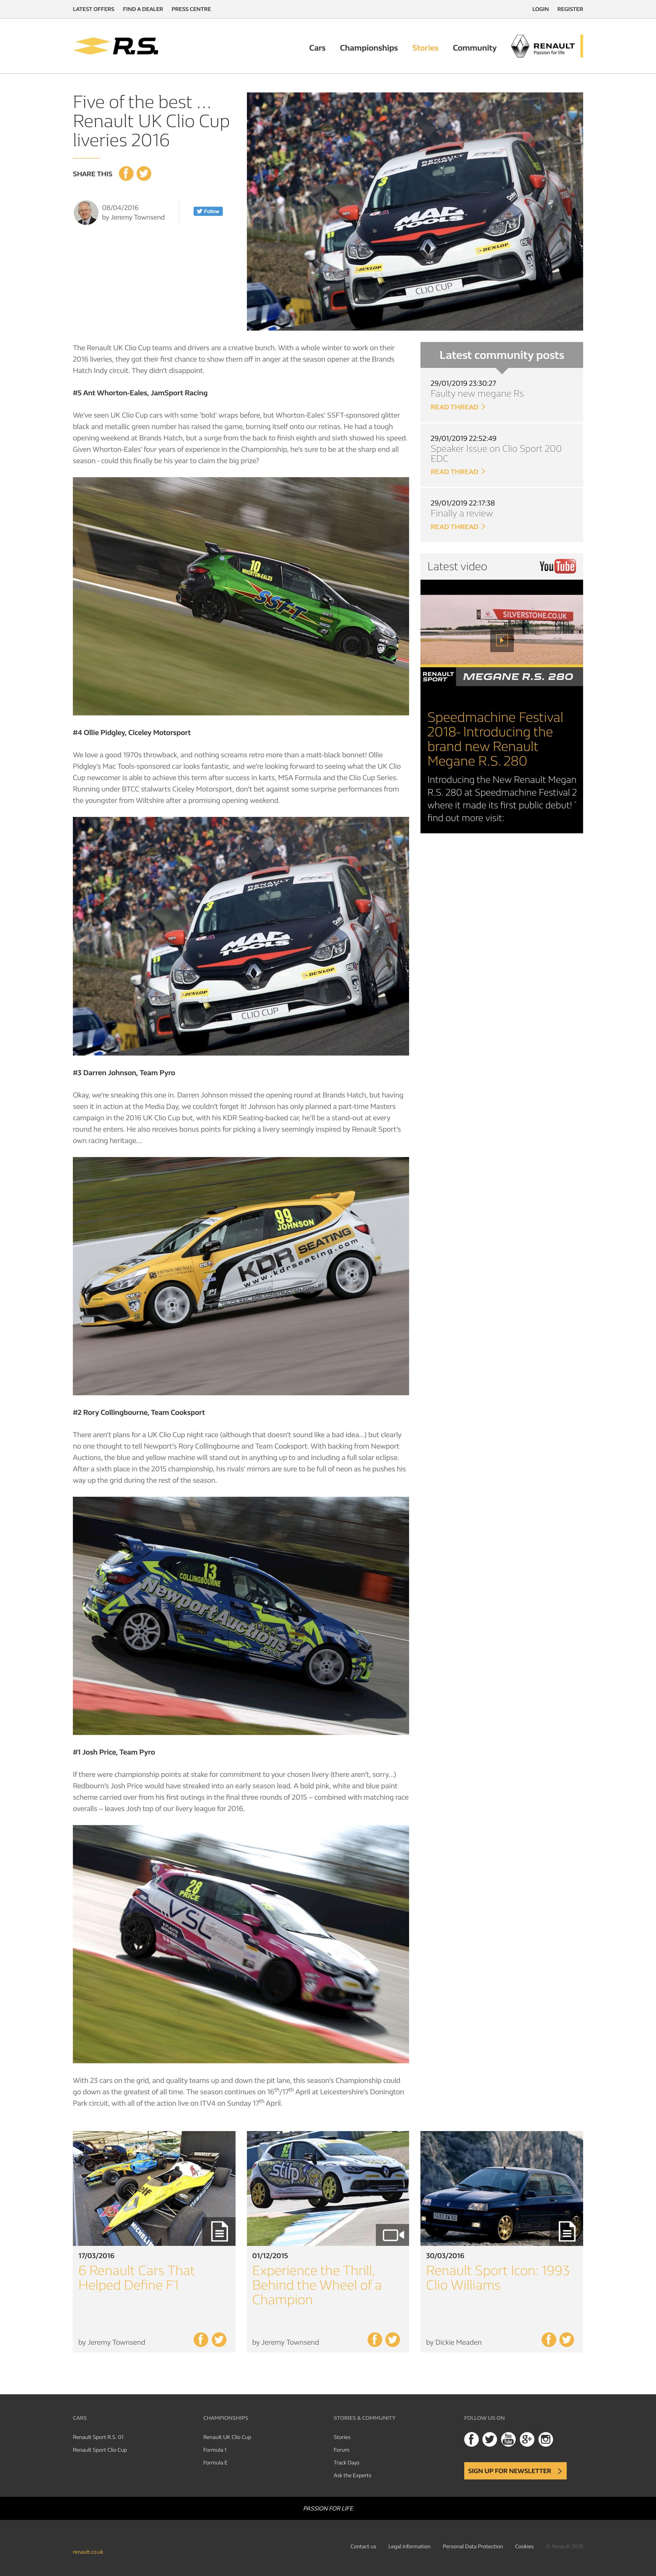 RenaultSportClio.jpg